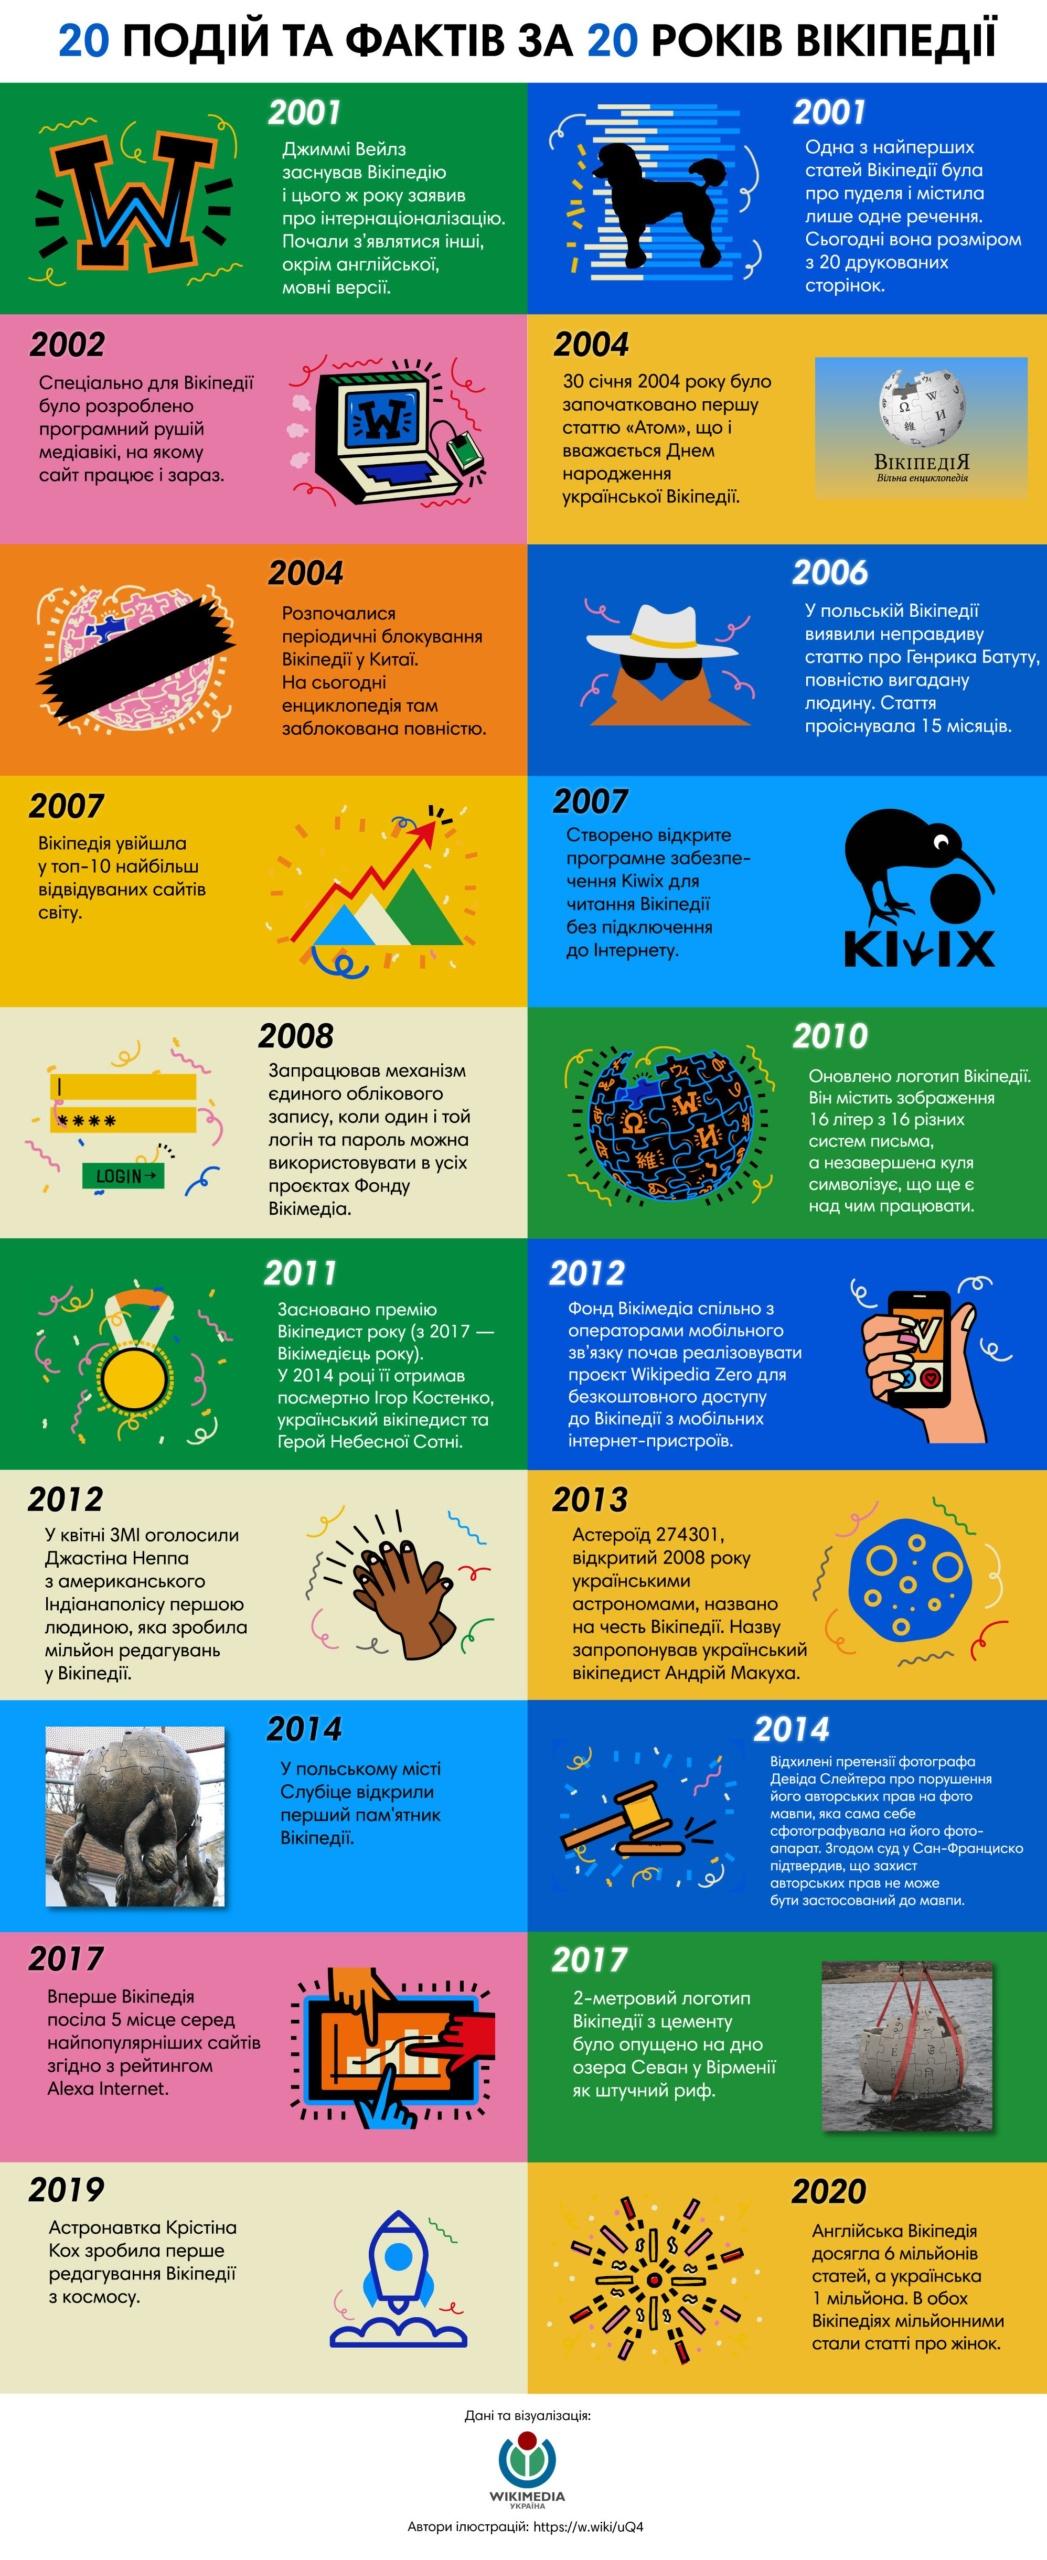 wikipedia 20 years